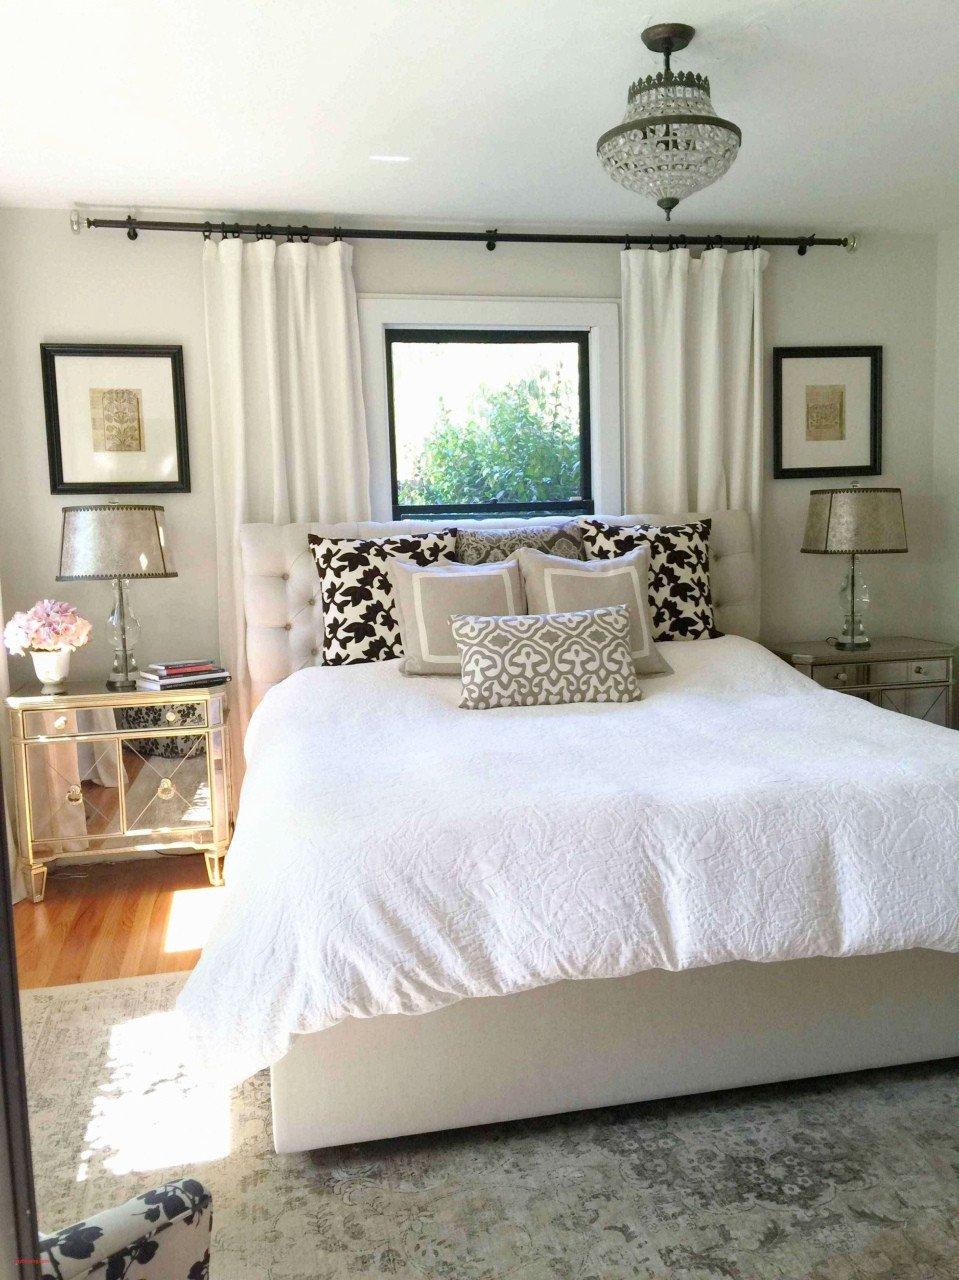 Full Bedroom Furniture Set Unique Shabby Chic Sheets — Procura Home Blog